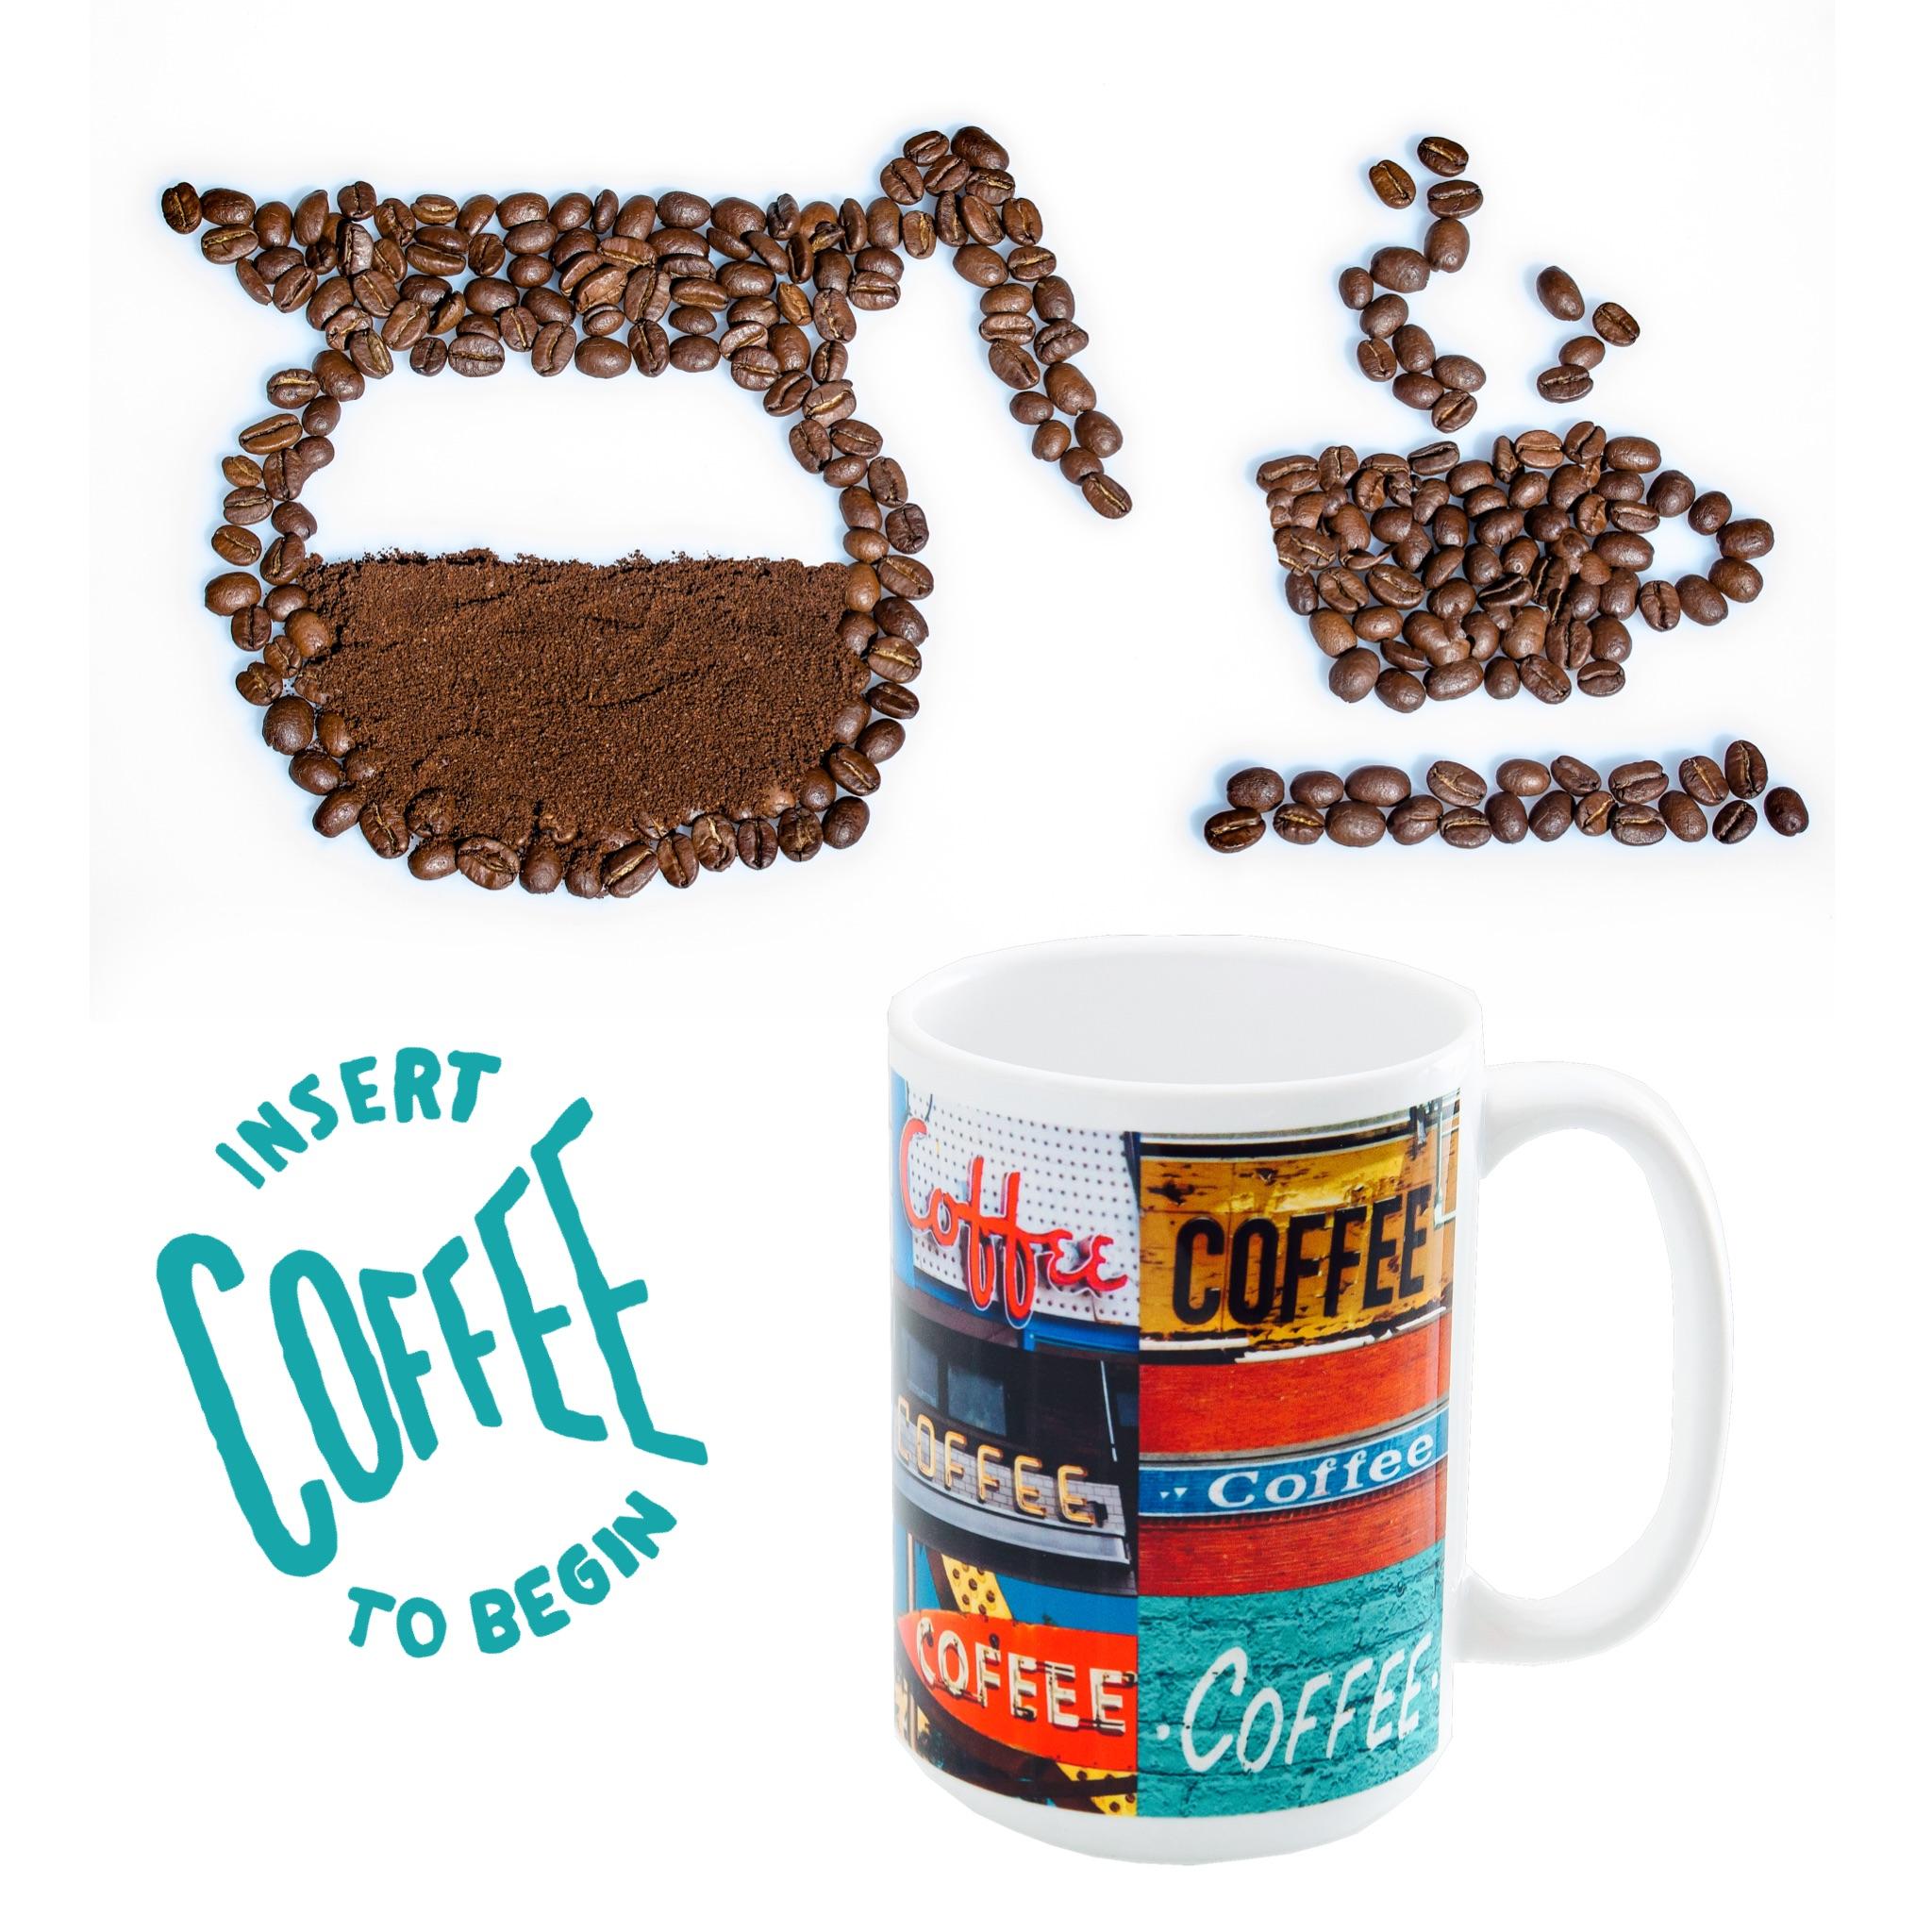 CoffeeMugPost.jpg